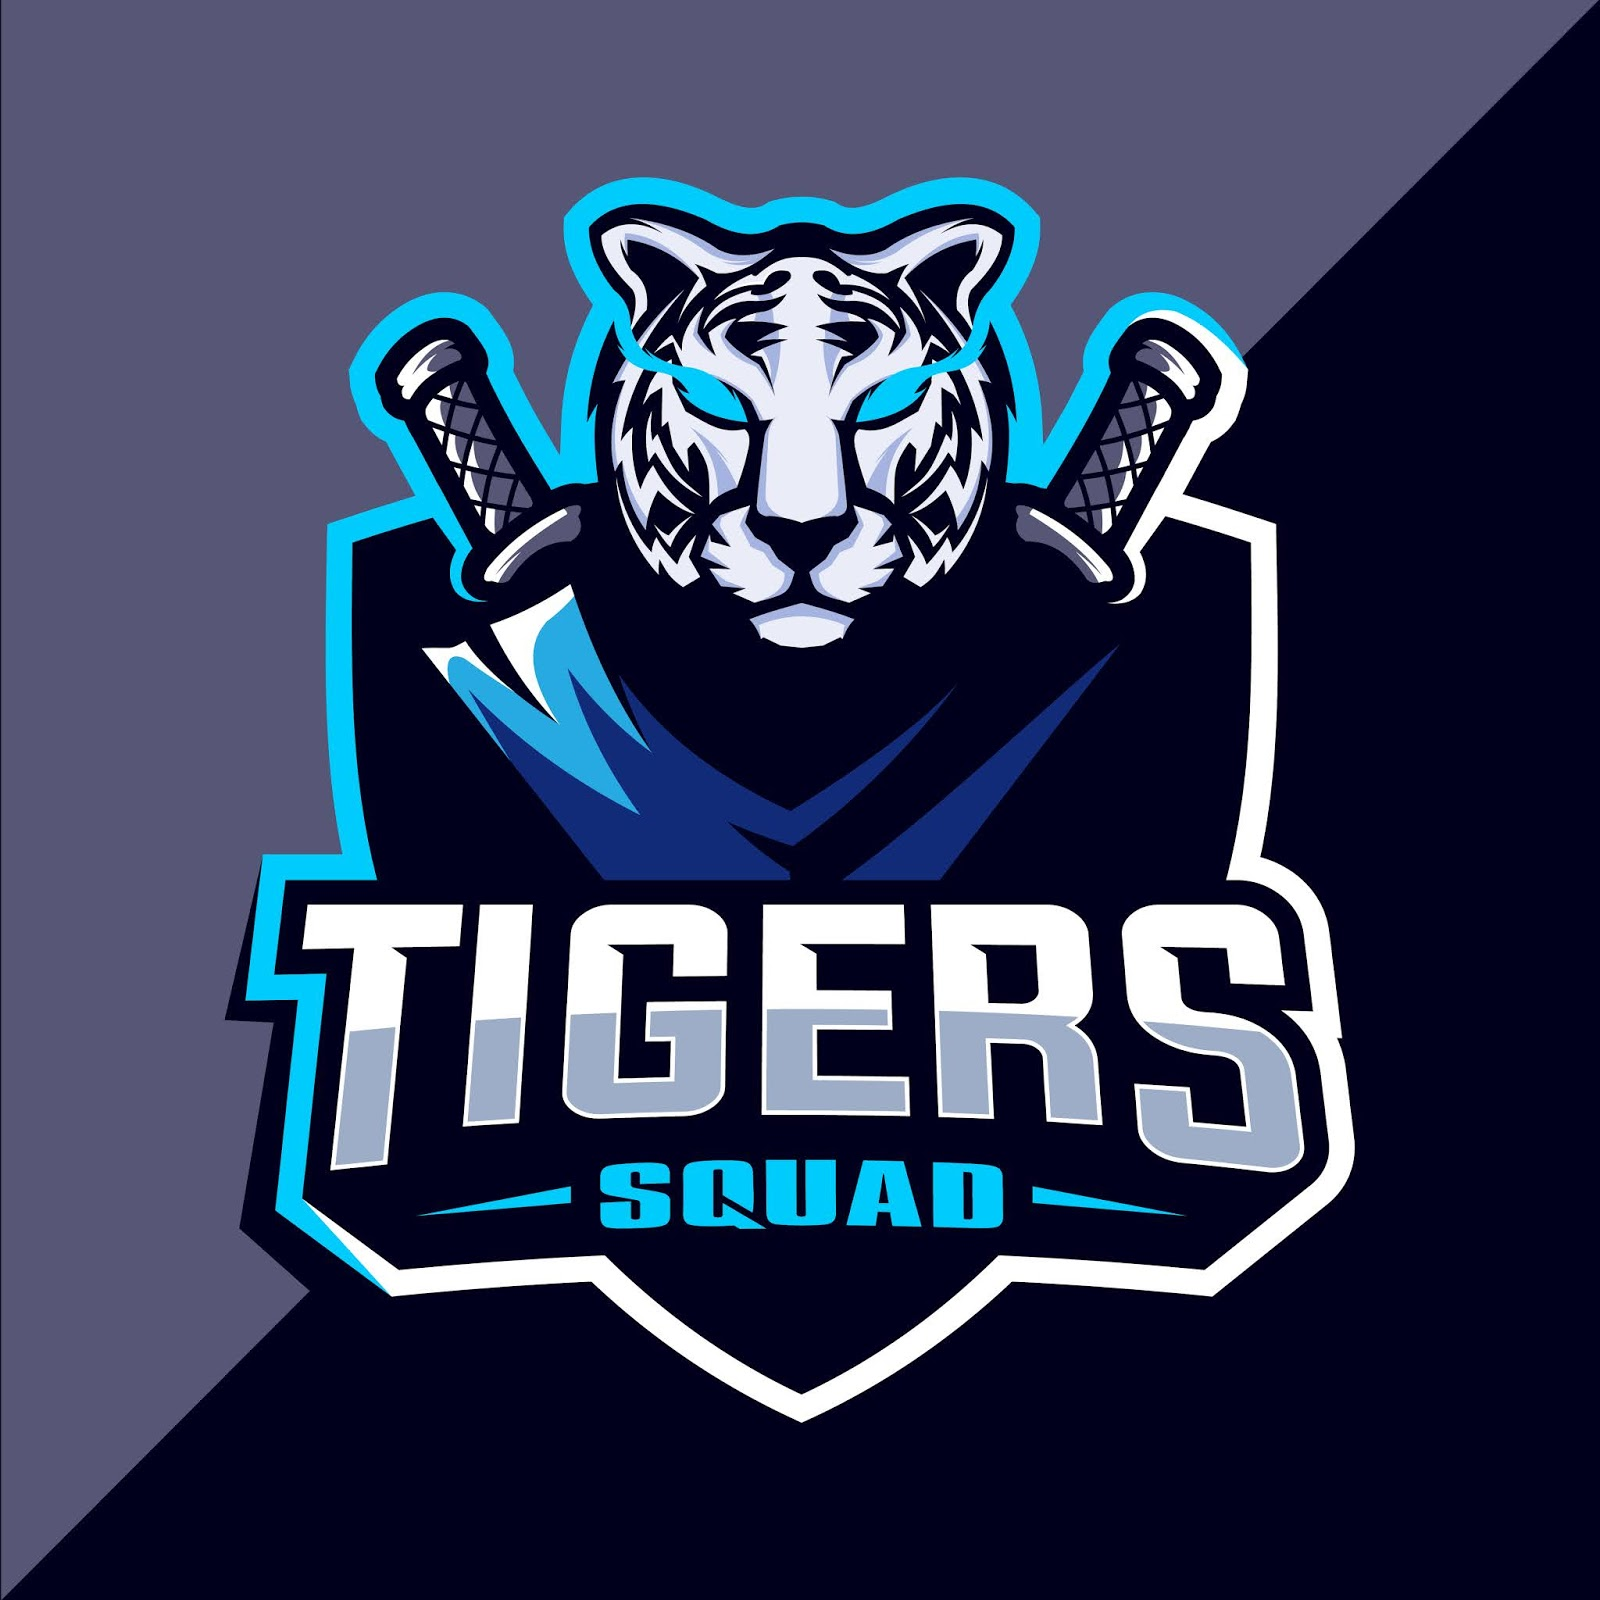 Tiger Mascot Esport Logo Free Download Vector CDR, AI, EPS and PNG Formats